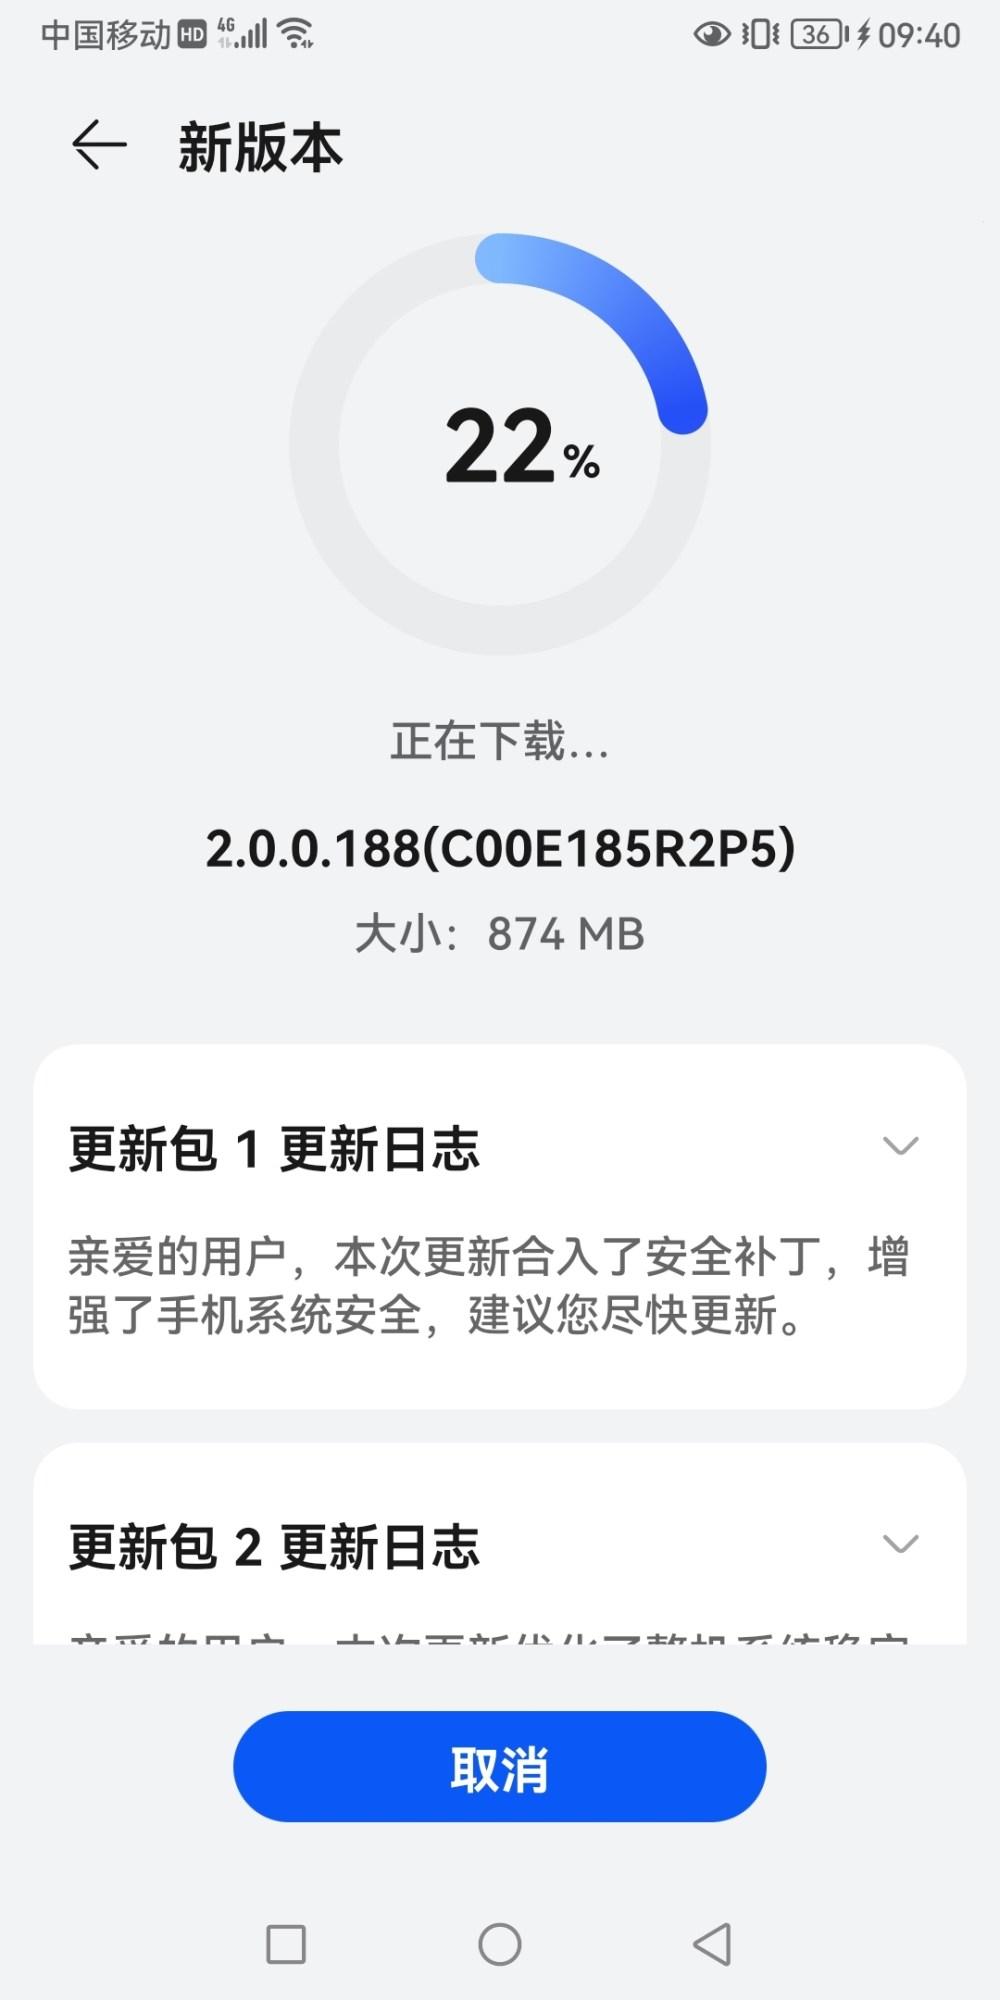 Huawei Mate 10 series HarmonyOS 2.0.0.188